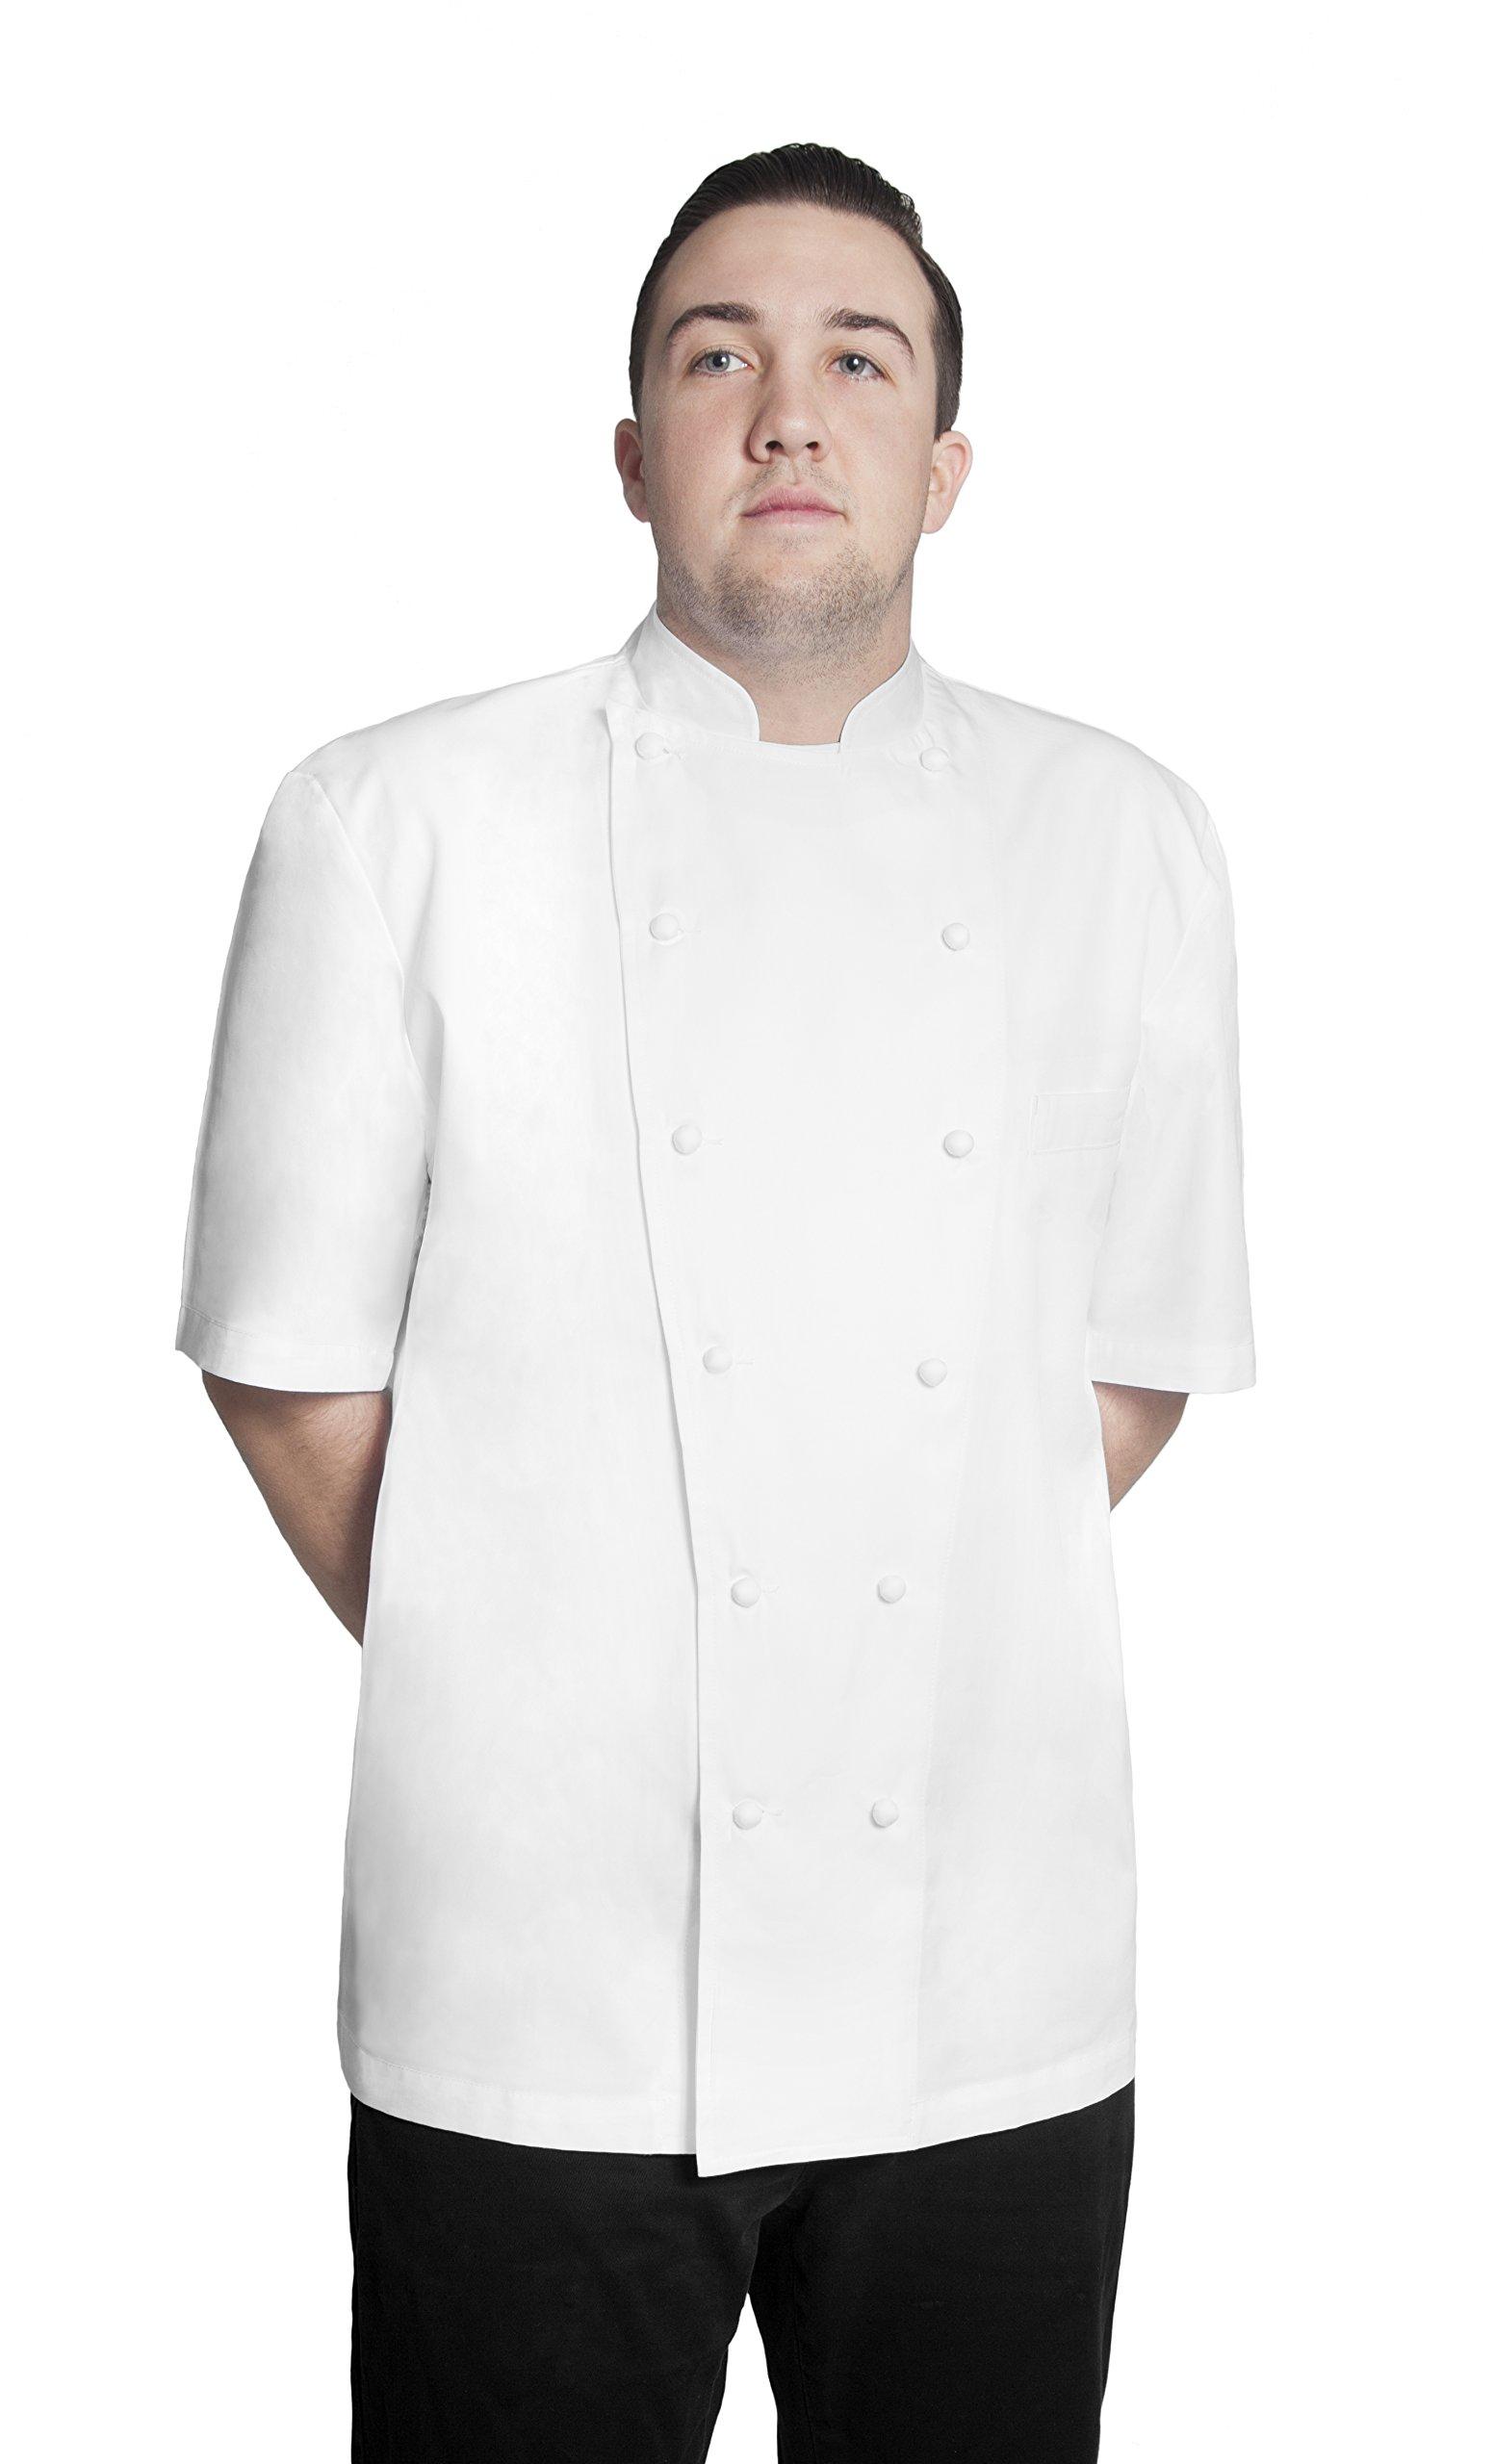 Bragard Grand Chef Jacket Short Sleeve with Chest Pocket Pima Cotton - White | Sizes 46 | by Bragard